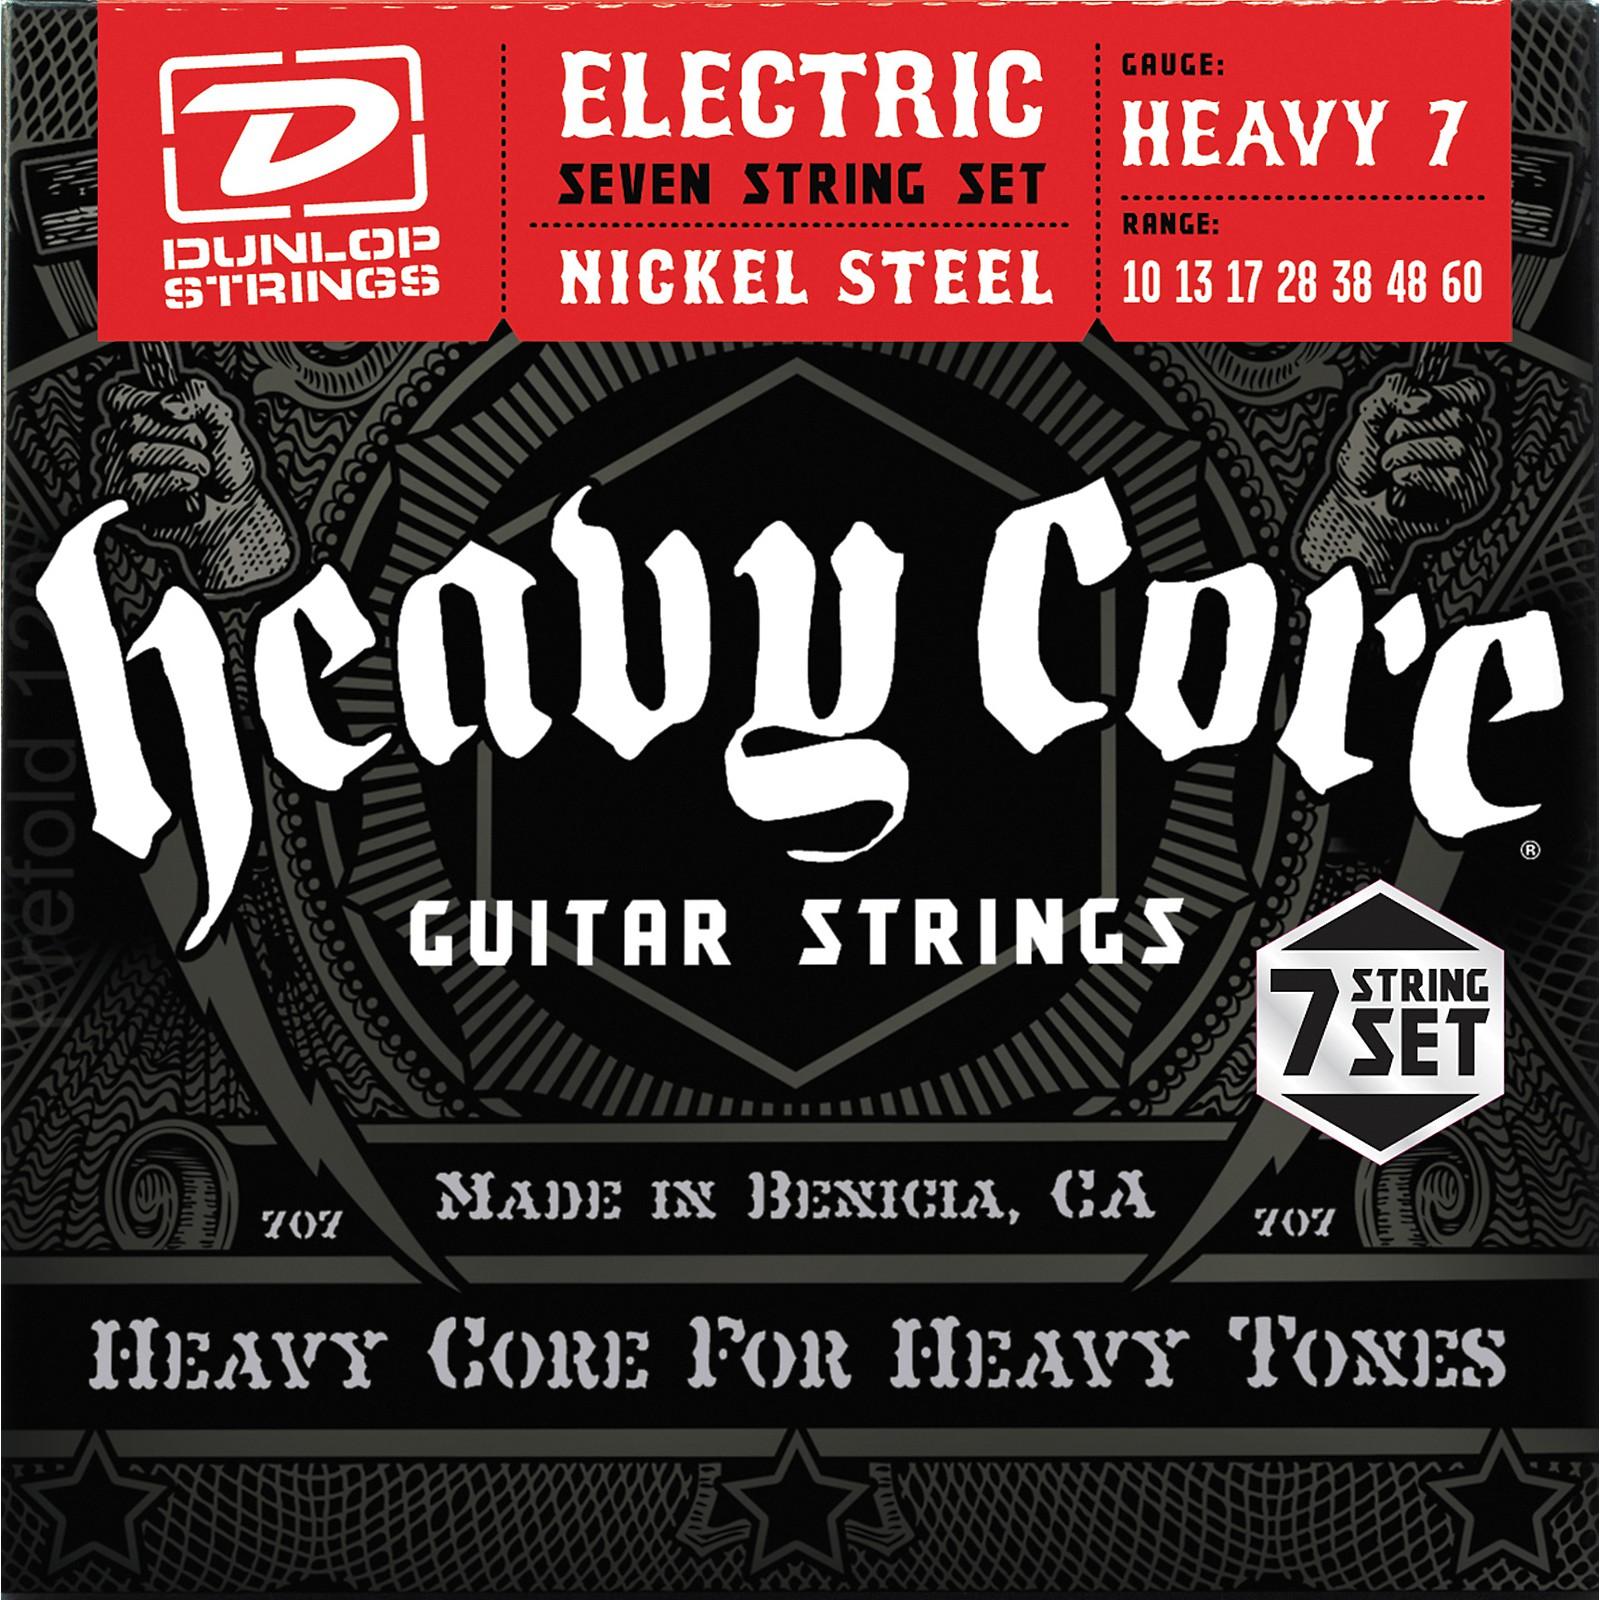 Dunlop Heavy Core 7-String Electric Guitar Strings - Heavy Gauge